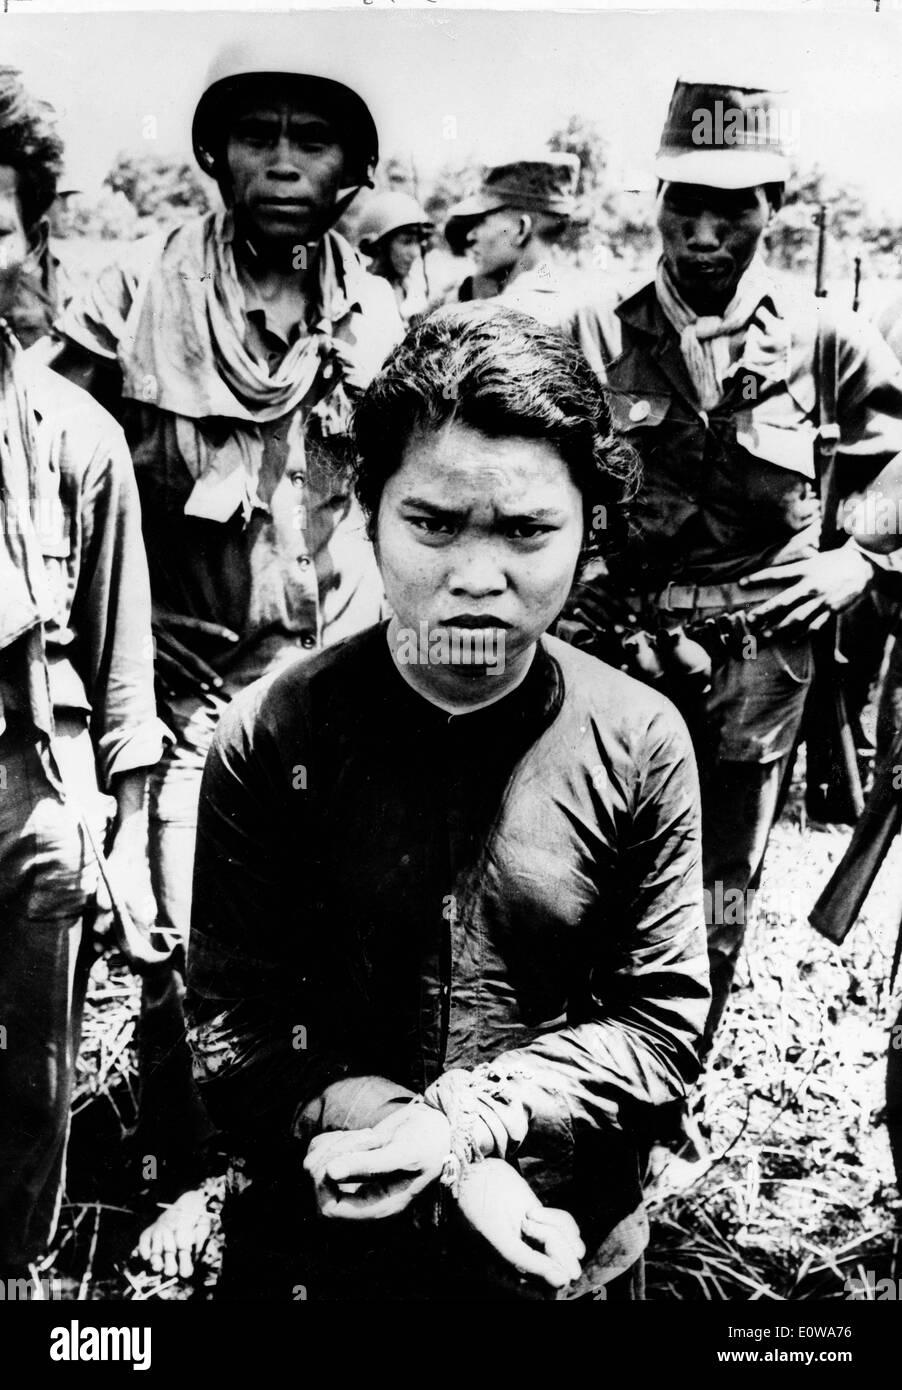 Vietnamesin Soldat gefangen Stockbild